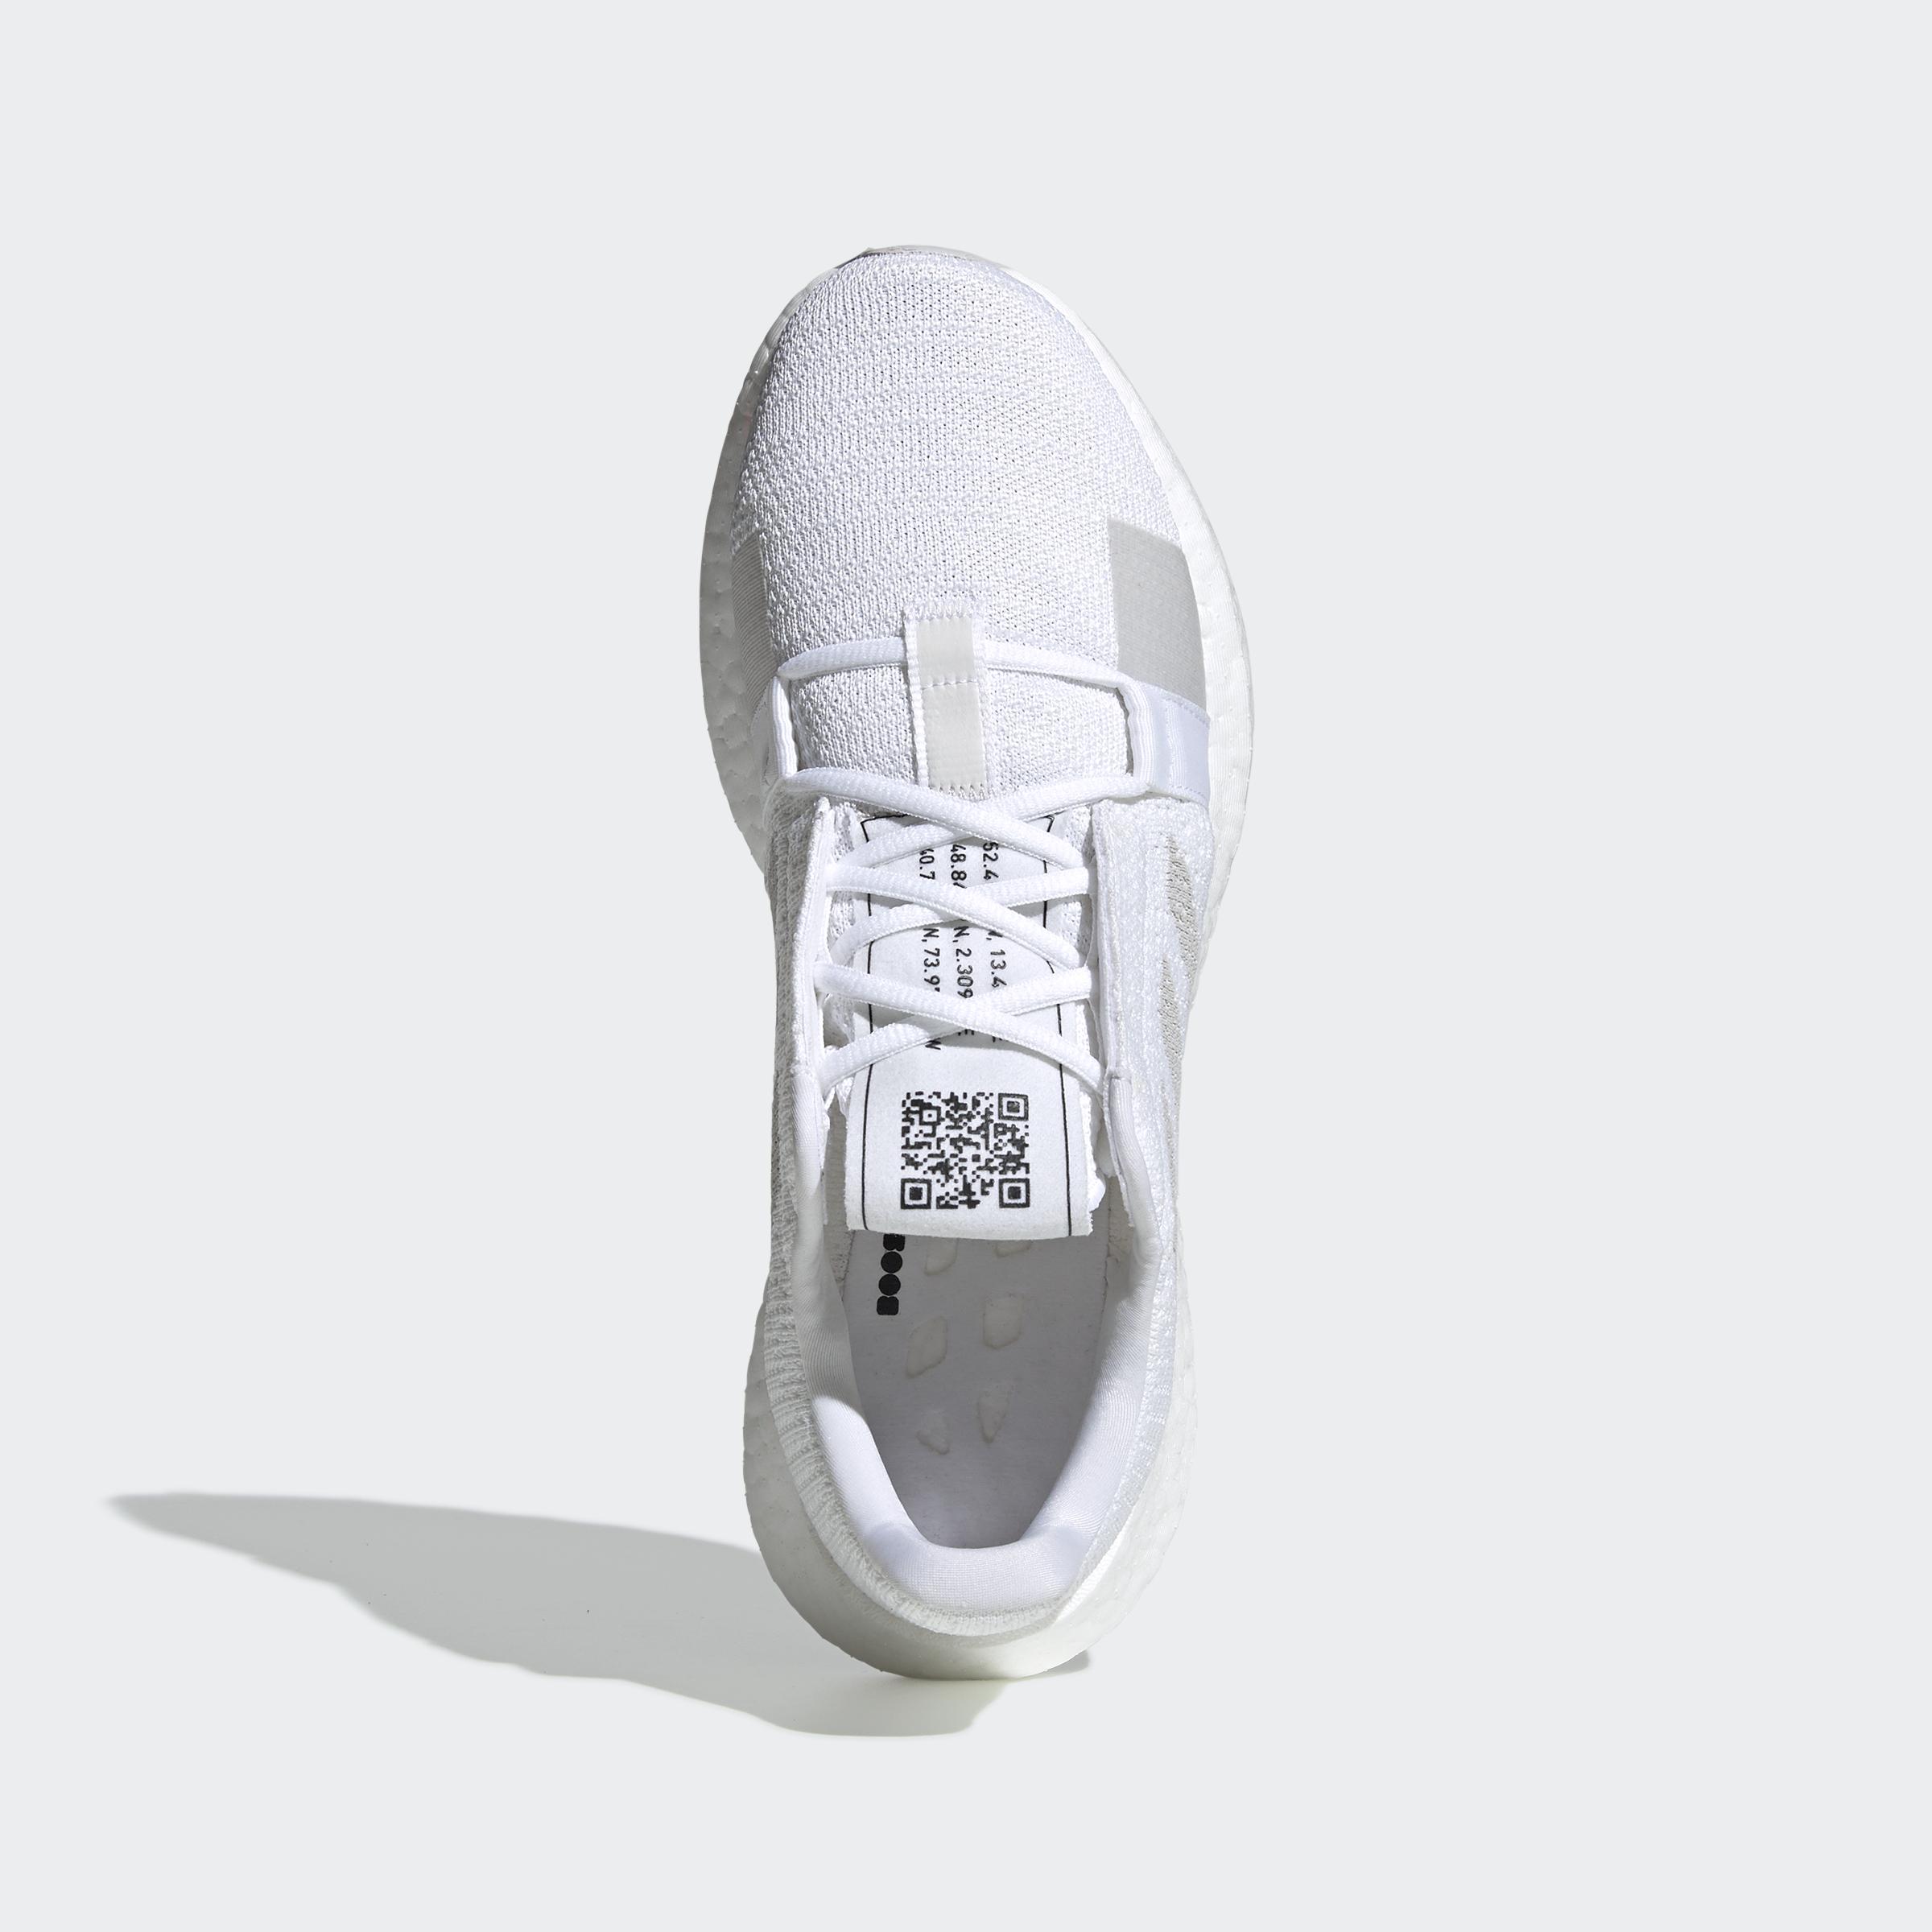 miniature 31 - adidas Senseboost Go Shoes Men's Athletic & Sneakers